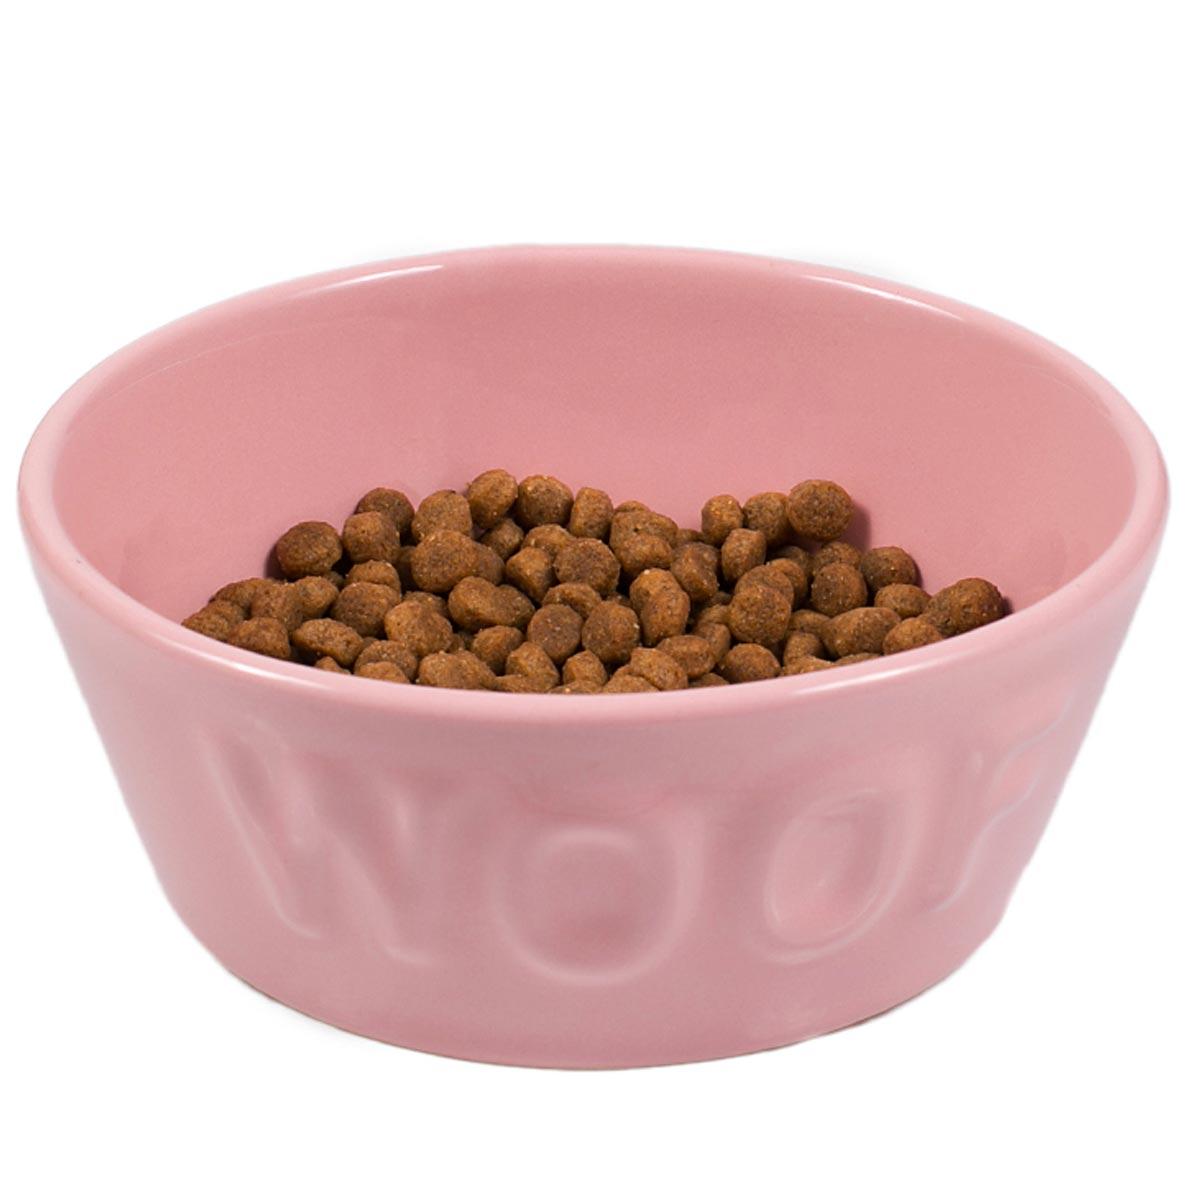 Comedouro Woof para Cachorro e Gato Esmaltado Rosa